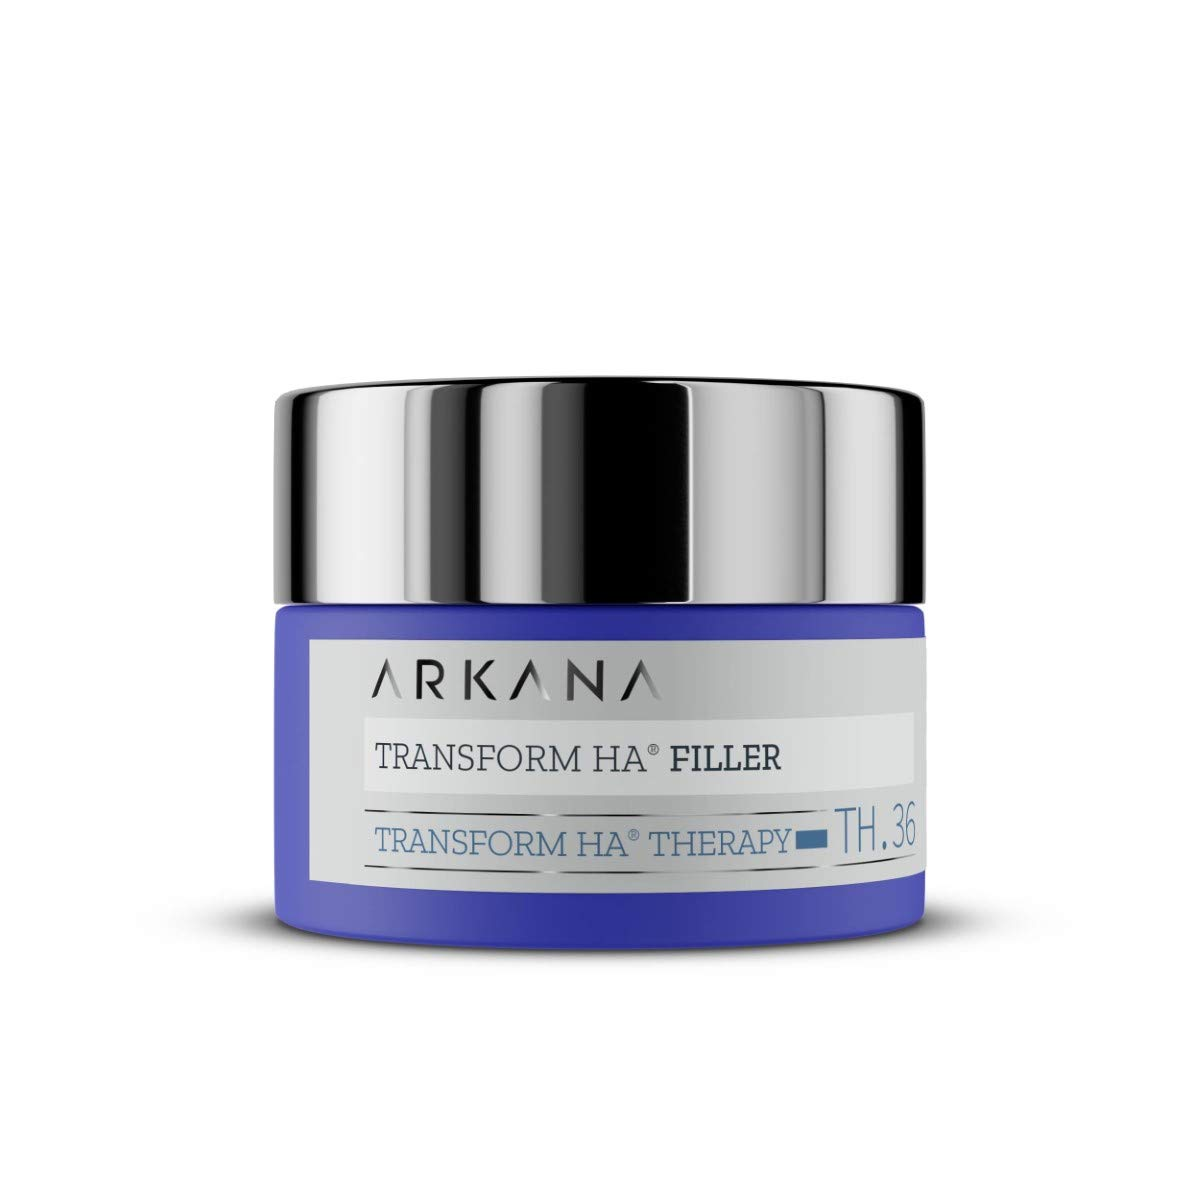 Moisturizing Anti Aging Atlanta Mall Face Cream Hyaluron Gradual of Release Ranking TOP17